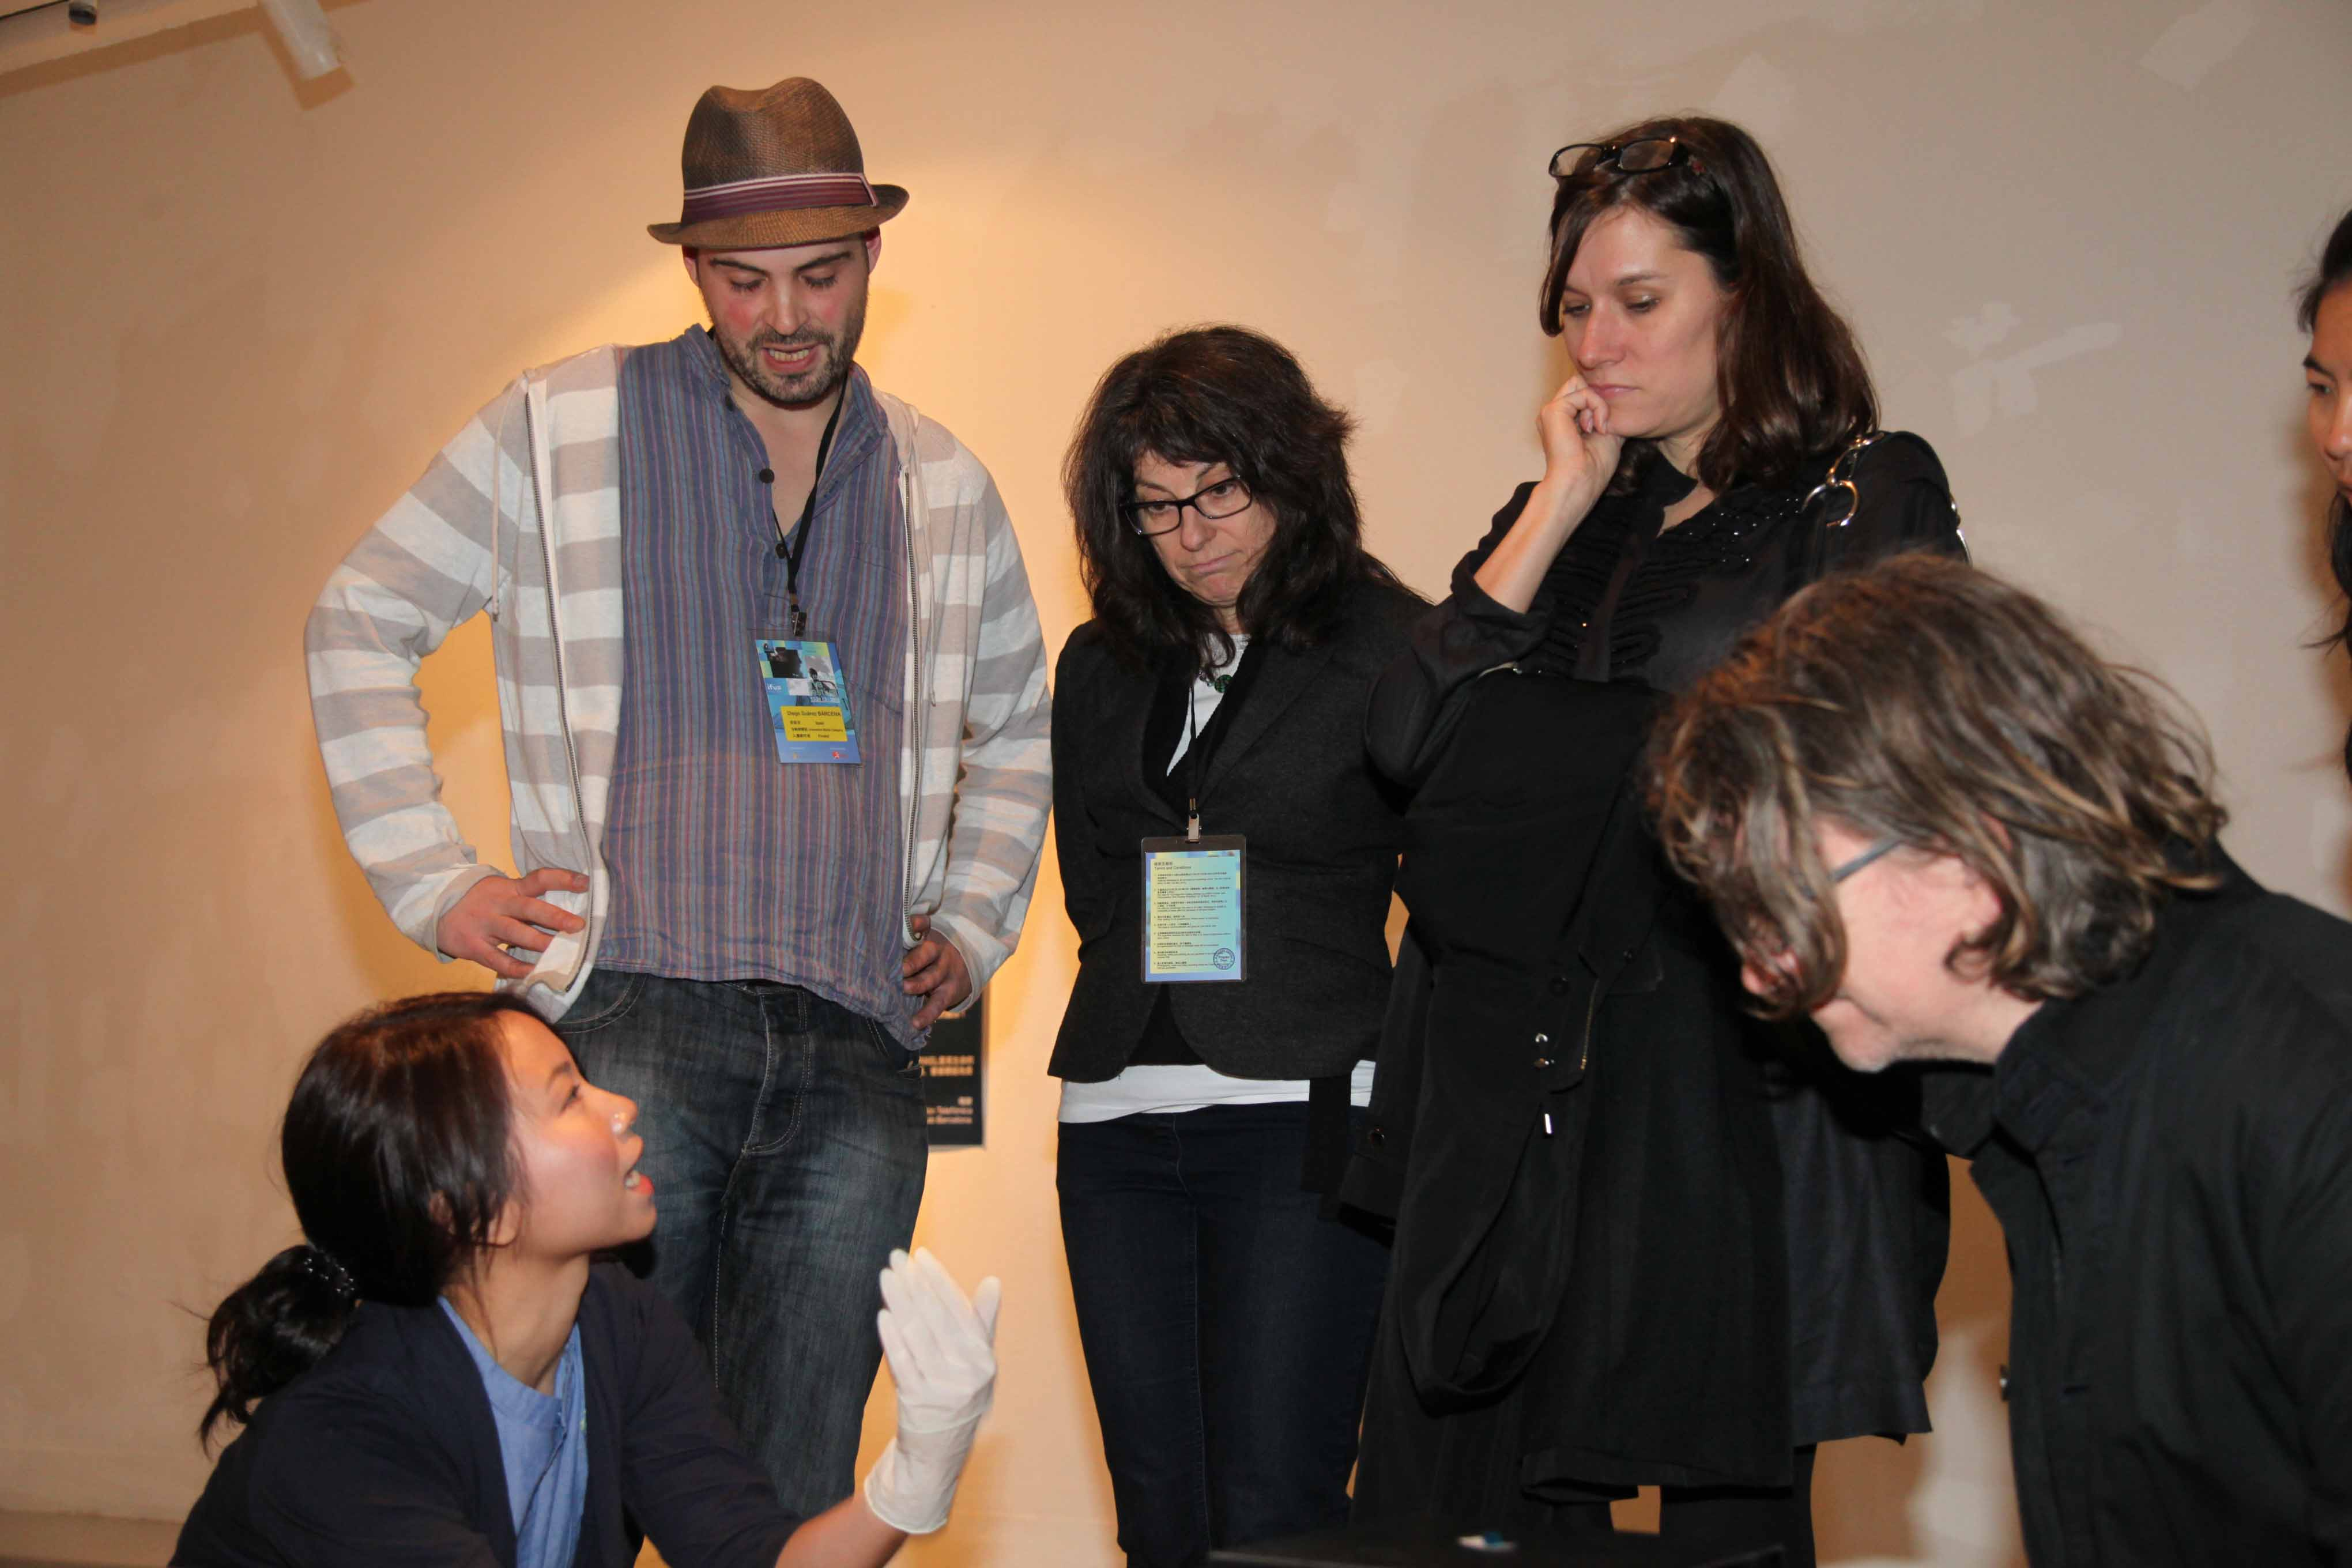 Diego Suárez Bárcena and Ani Pui-hing explaining their finalist work <i>Pixel Bite</i> to Diane Landry and Jennifer & Kevin McCoy